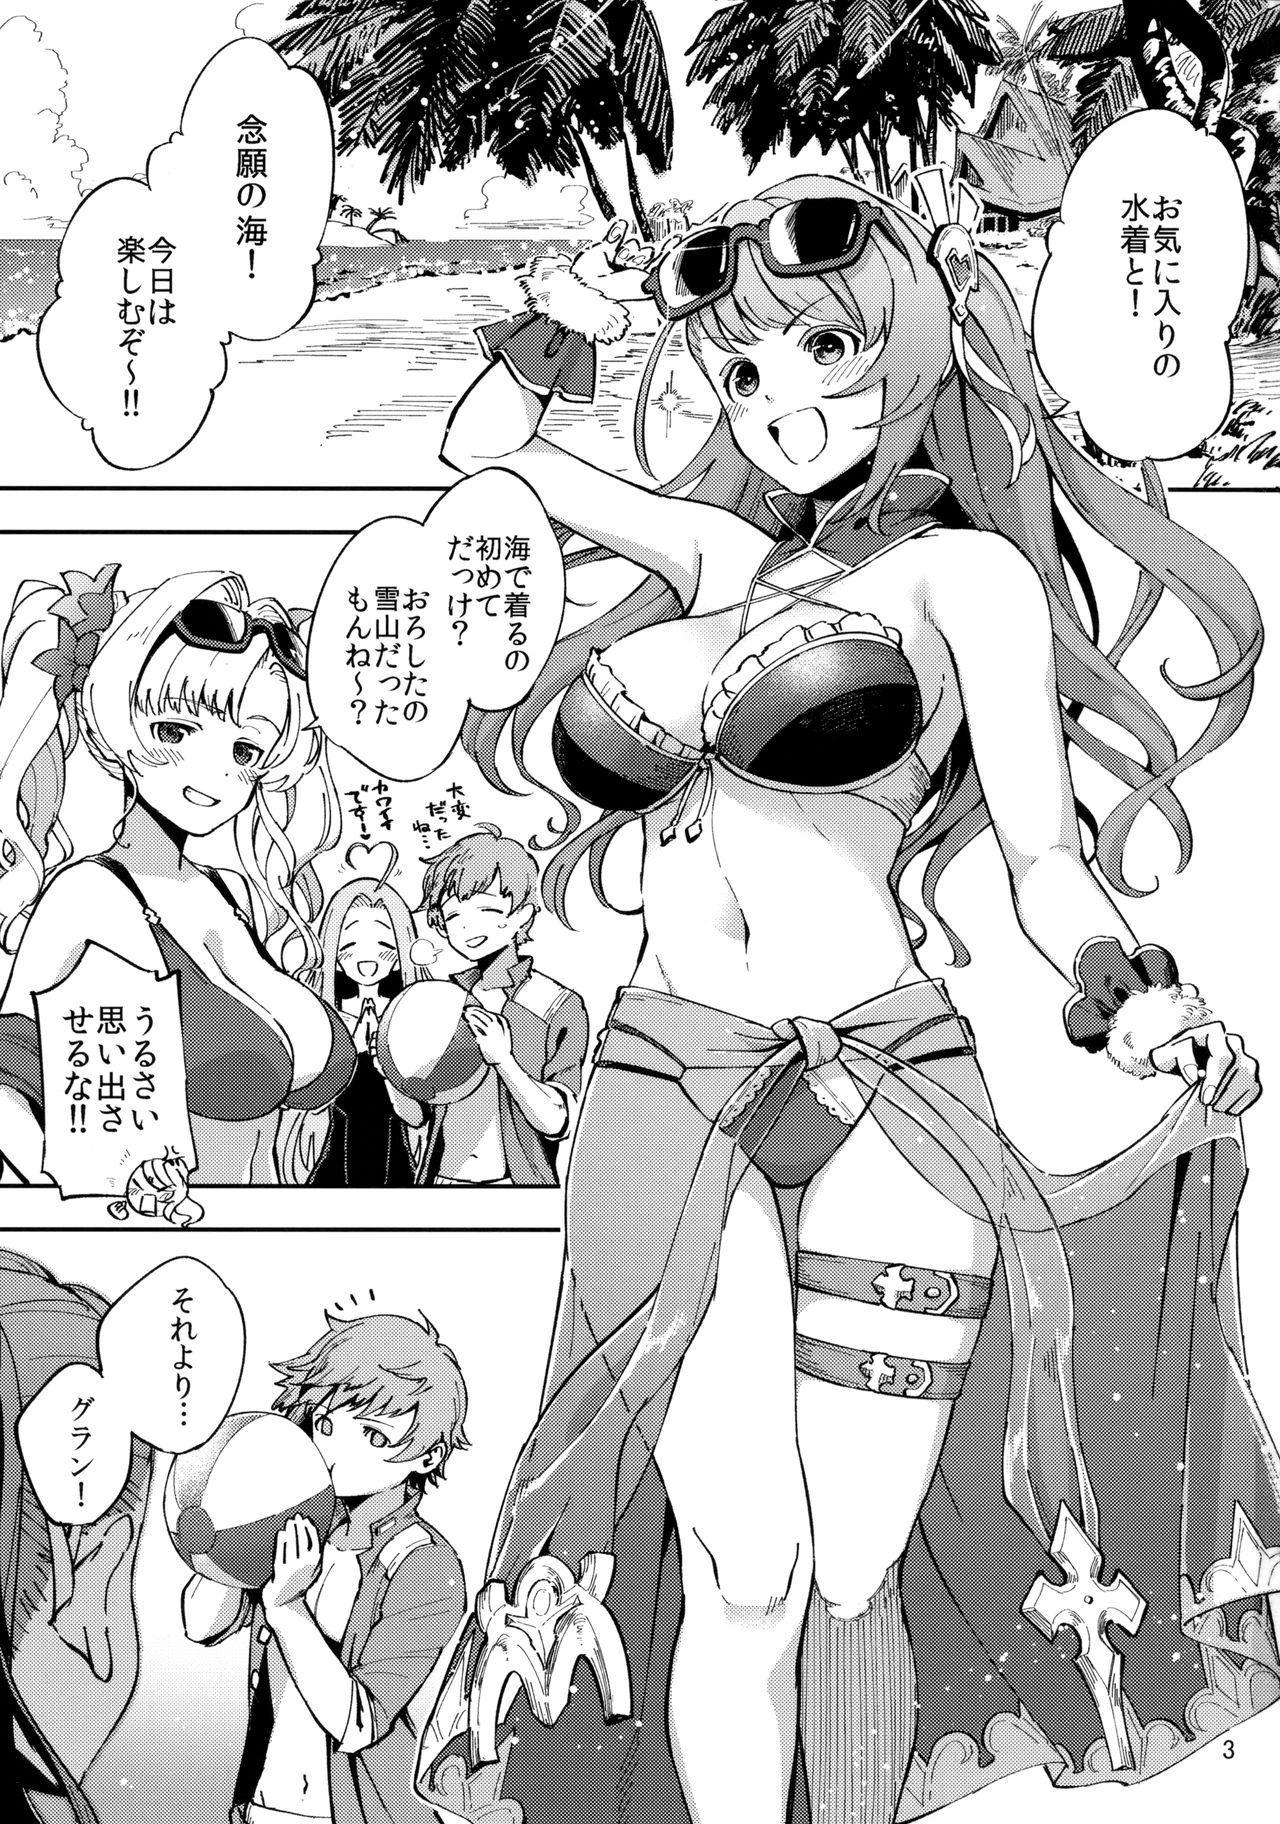 Bea ga Mizugi ni Kigaetara 1